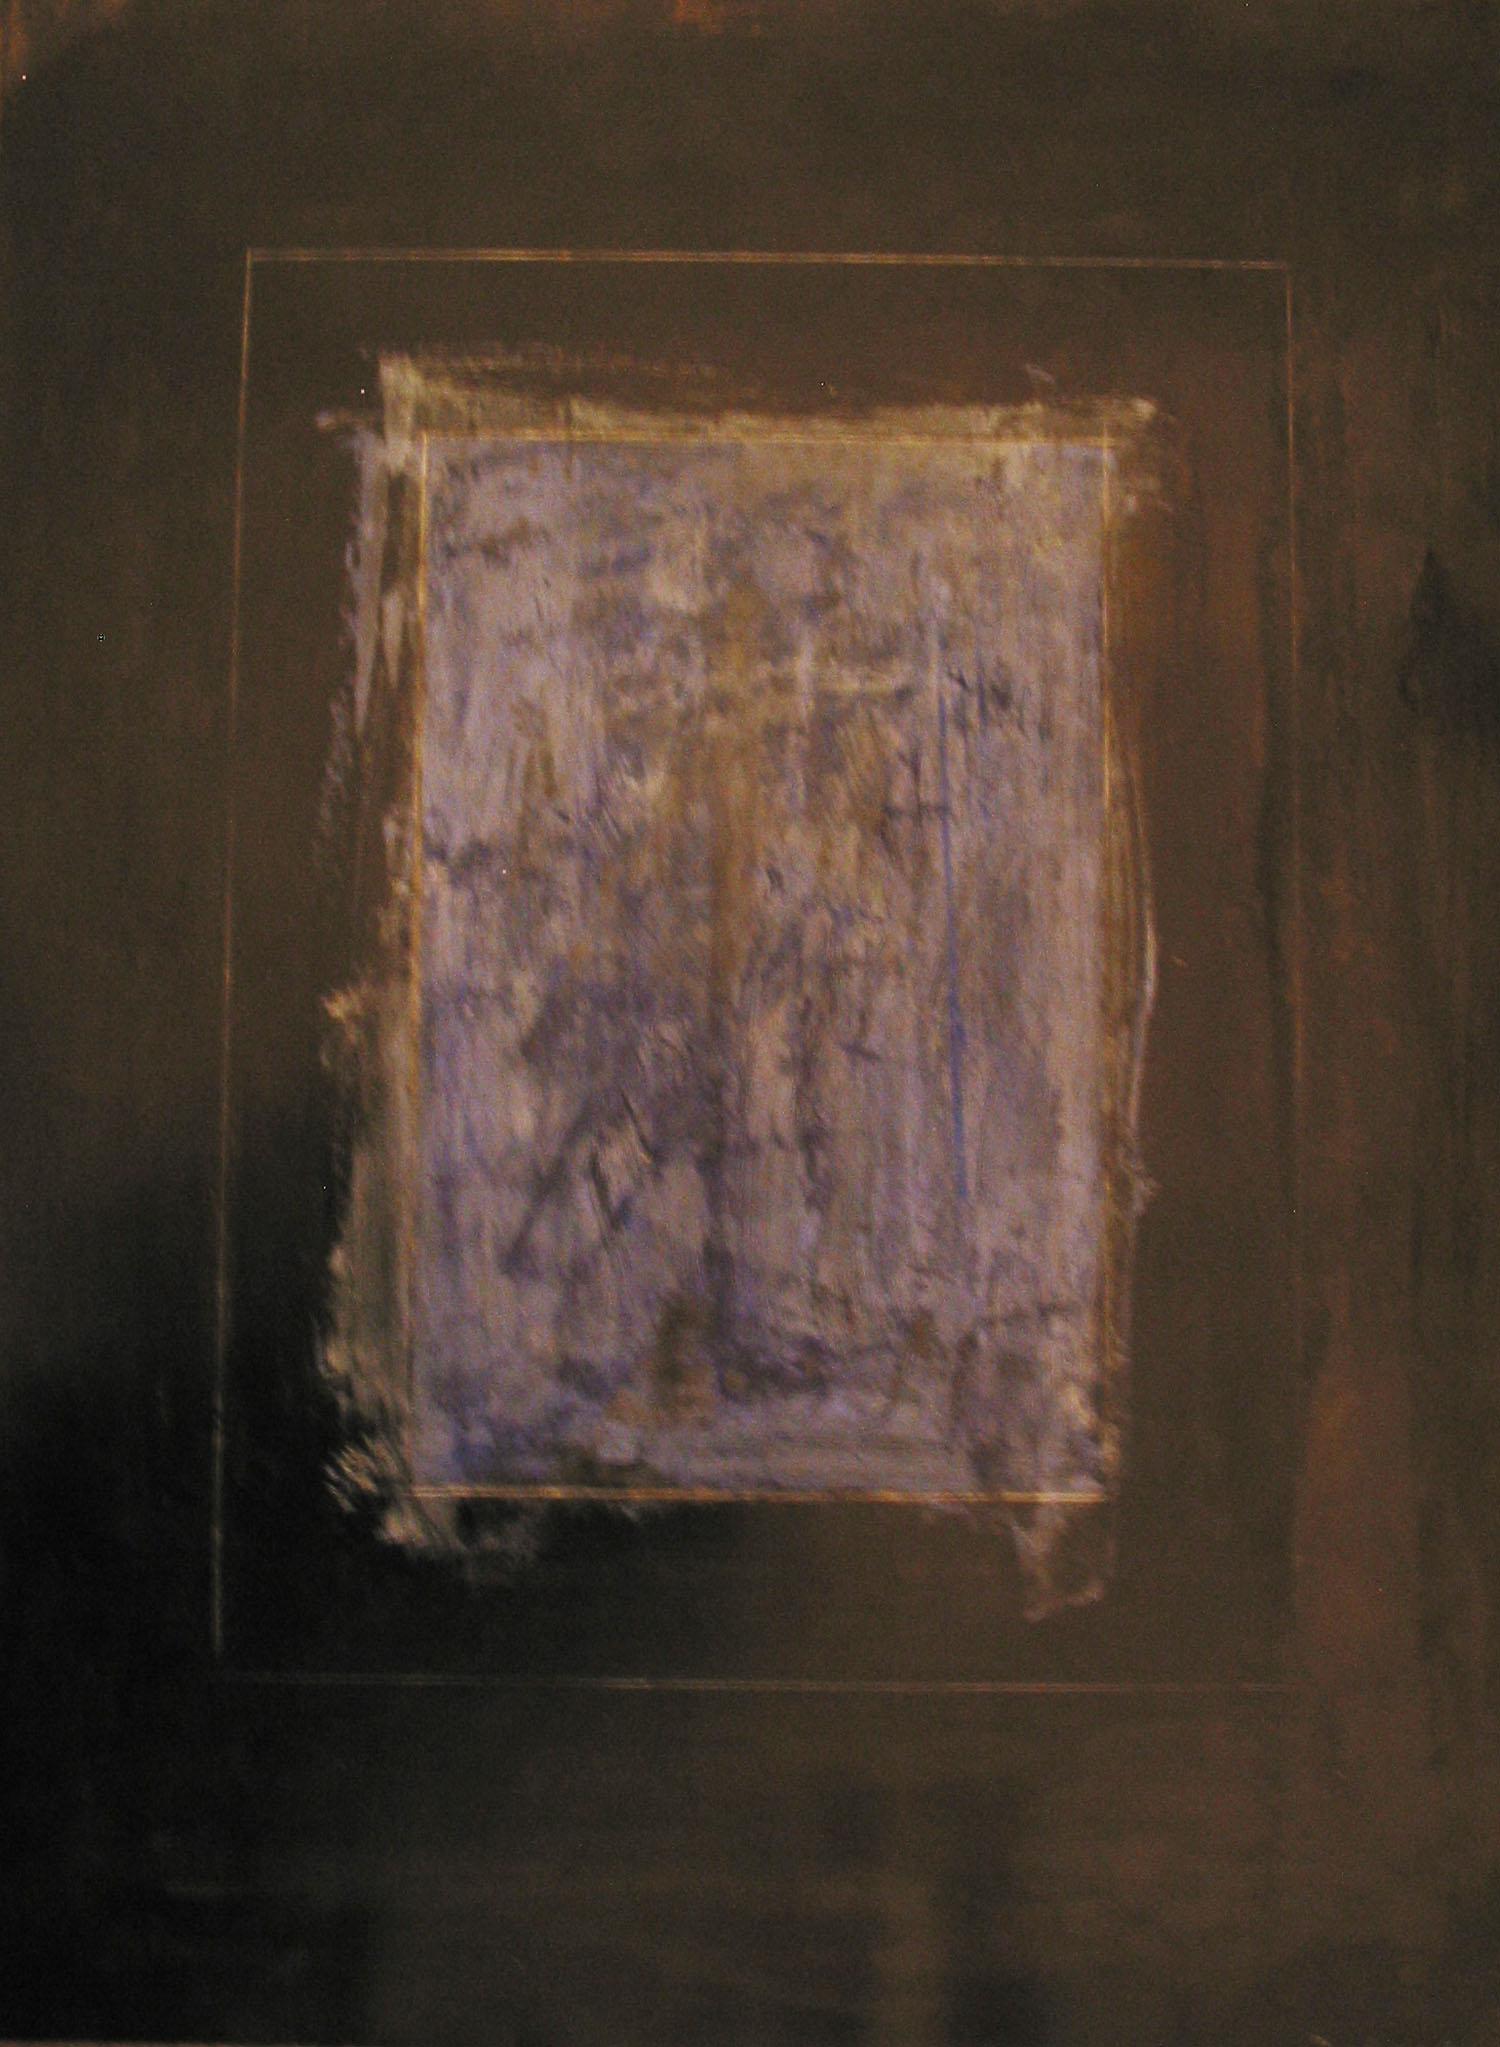 Liam Roberts_-_Velazquez Mirror III_acrylic and  pencil on paper_59 x 43cm.jpg